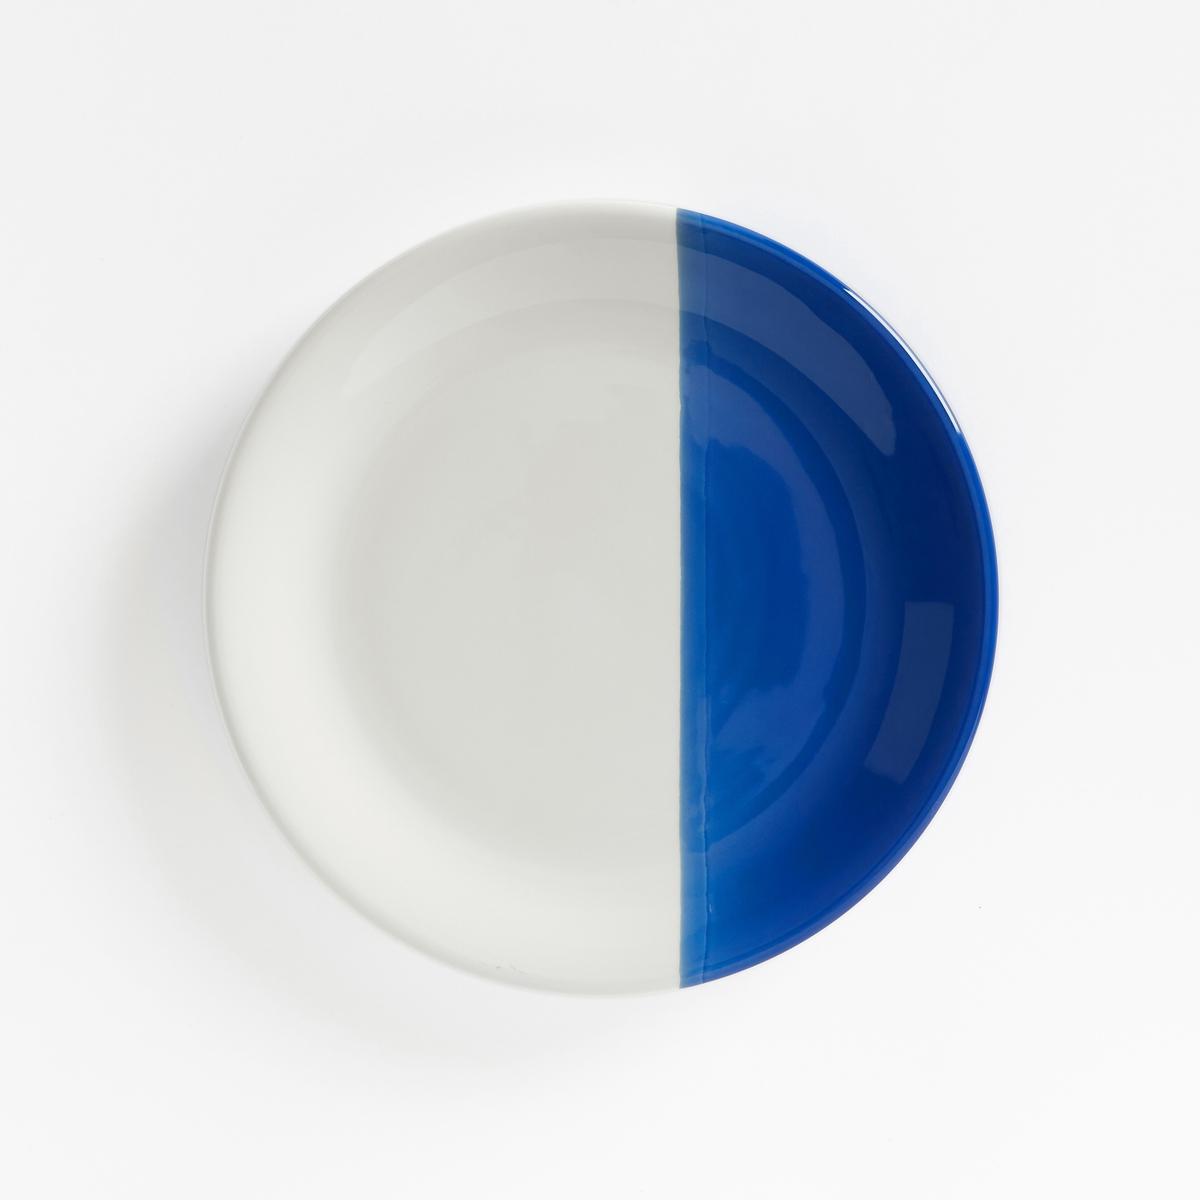 Комплект из 4 десертных тарелок, ZALATO roomble комплект тарелок zanotty i